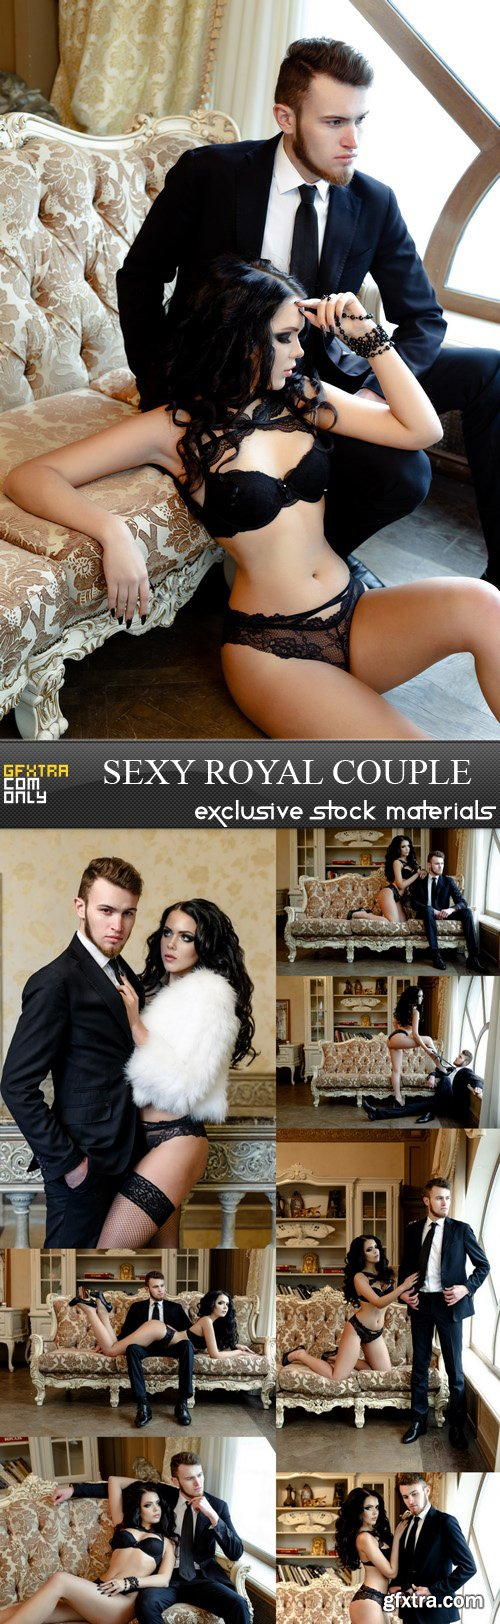 Sexy Royal Couple - 8 UHQ JPEG